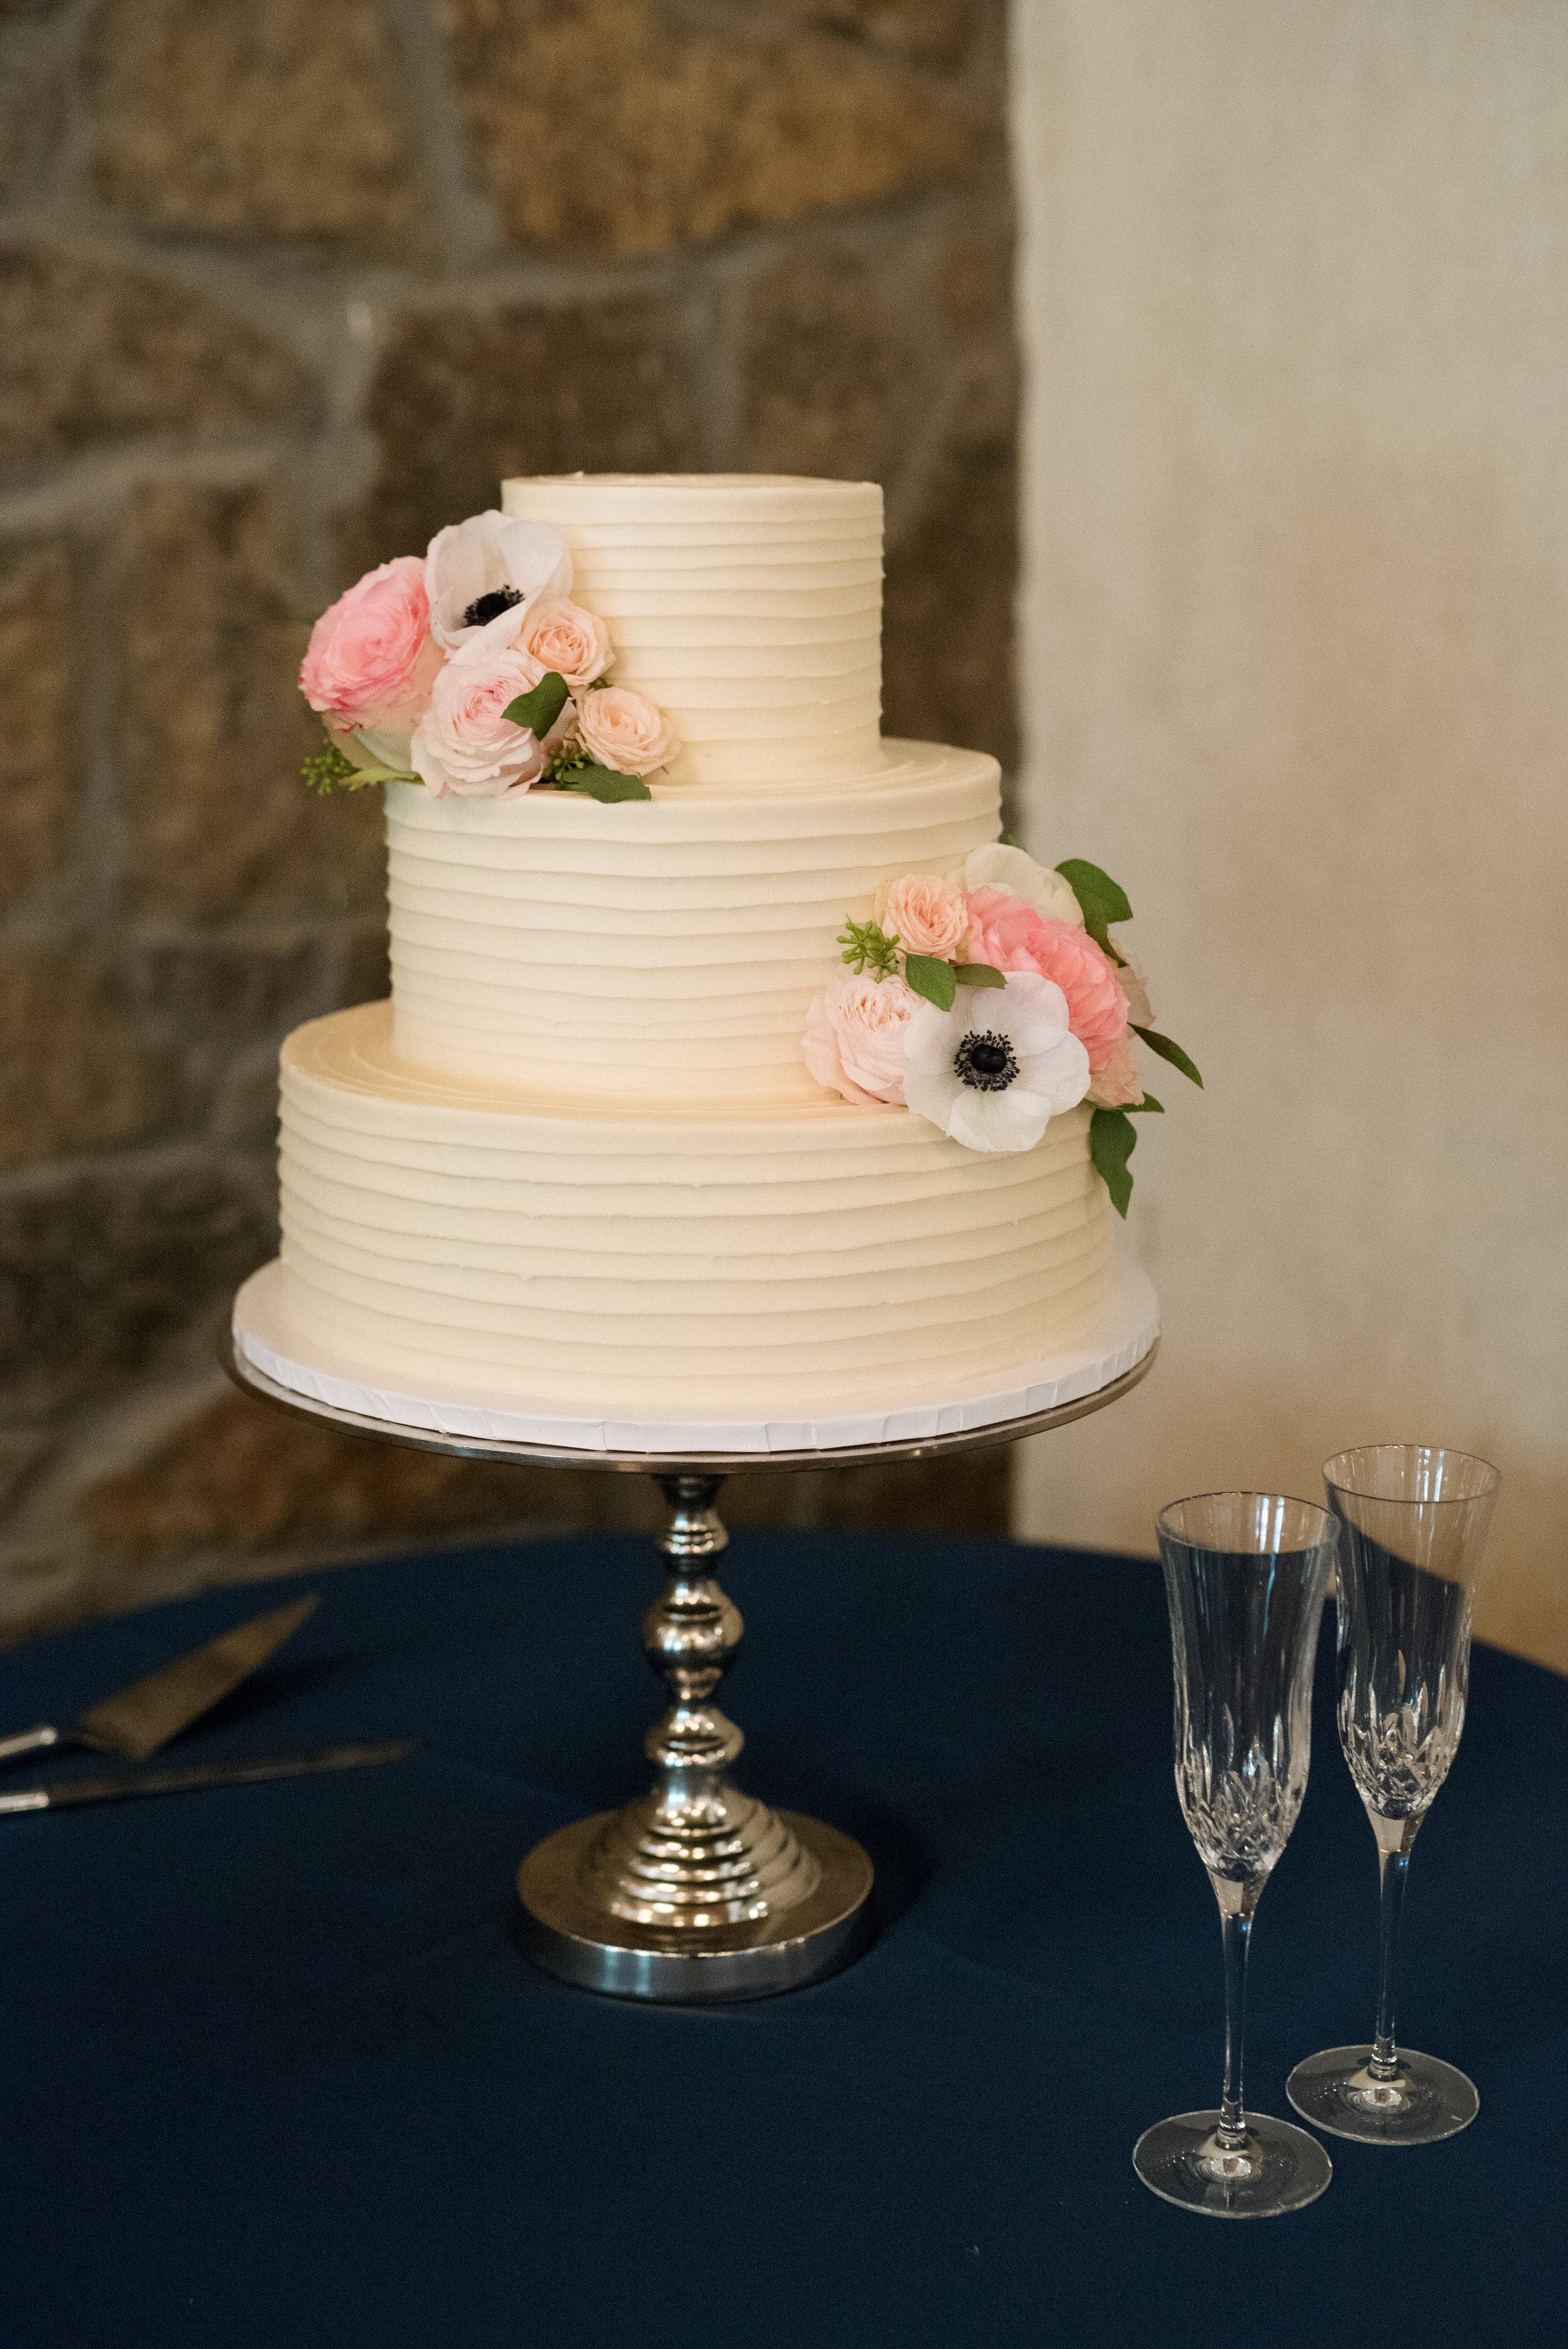 Ma Maison Austin Wedding Venue_ Austin Wedding Planner Heavenly Day Events _ Kristi Wright Austin Wedding Photographer20160306_0124.JPG